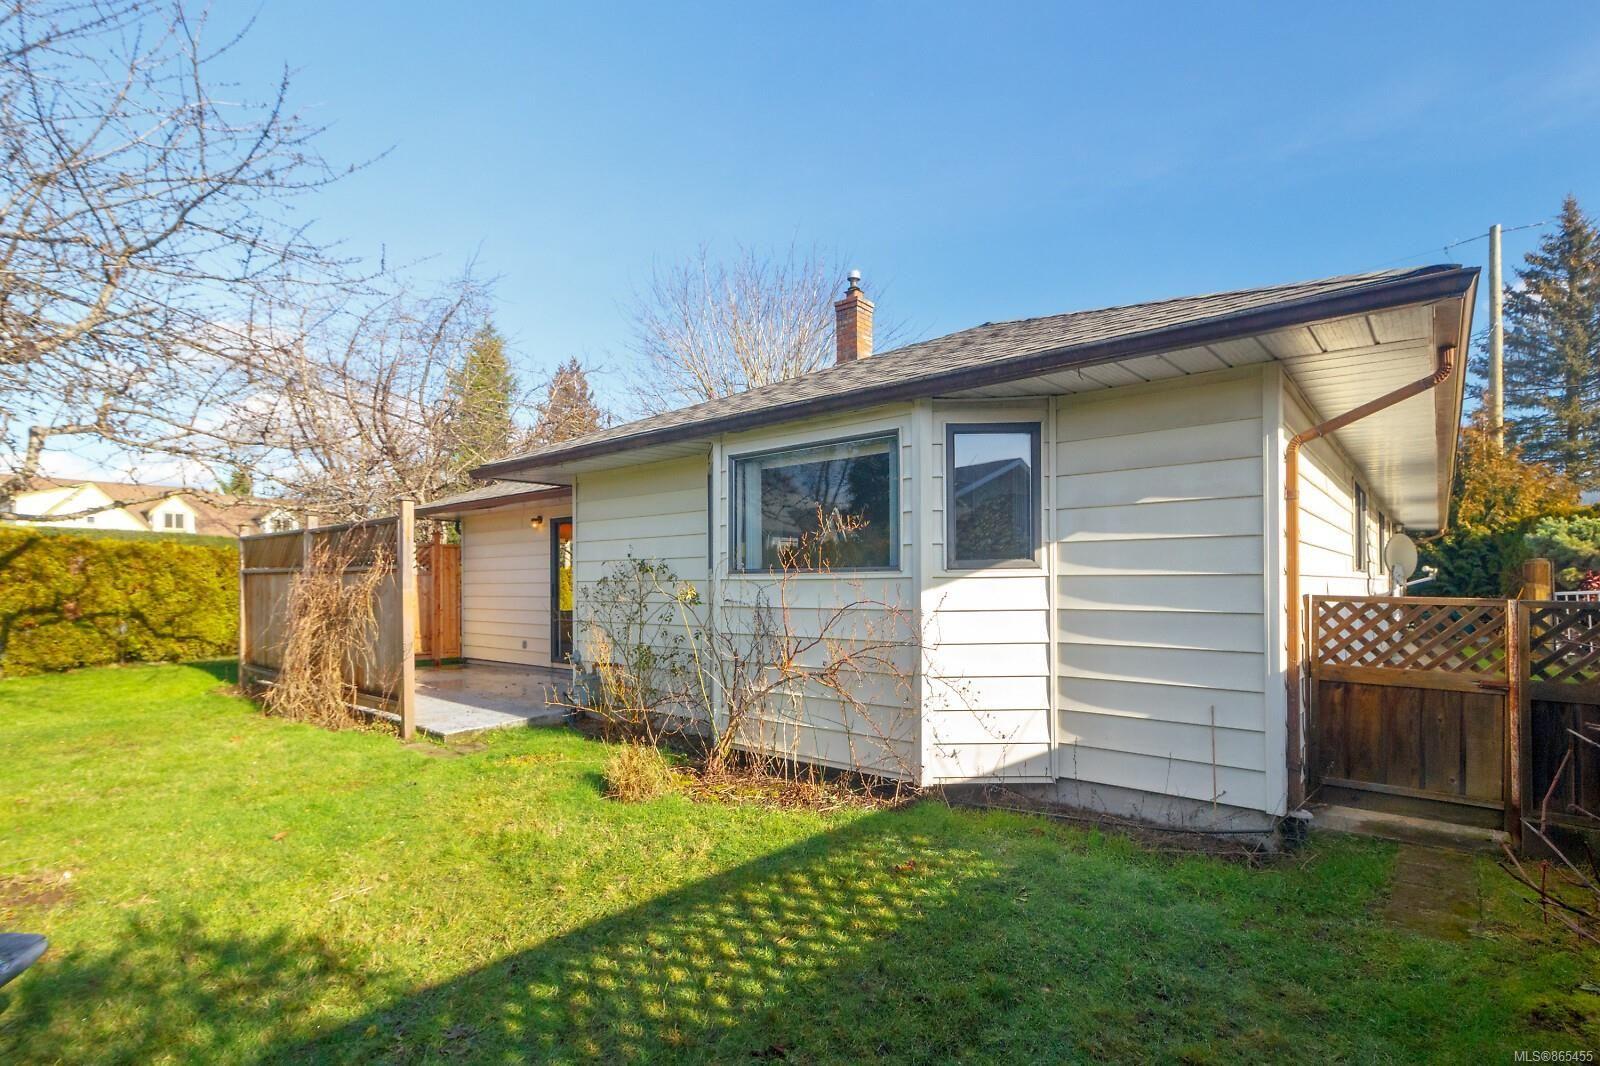 Photo 30: Photos: 399 Beech Ave in : Du East Duncan House for sale (Duncan)  : MLS®# 865455